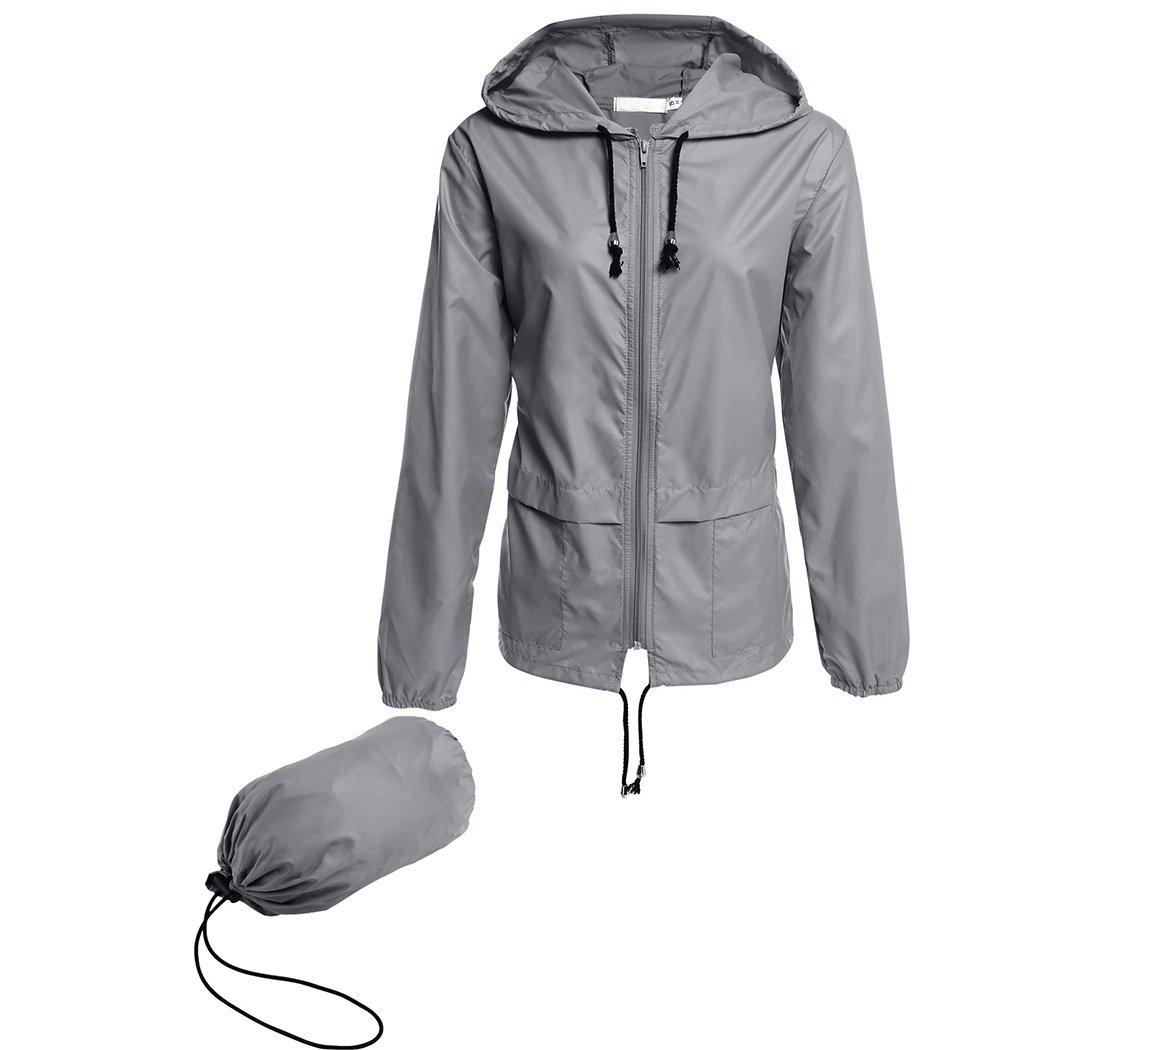 Hount Women's Hiking Lightweight Hooded Waterproof Packable Rain Jacket (L, Gray)